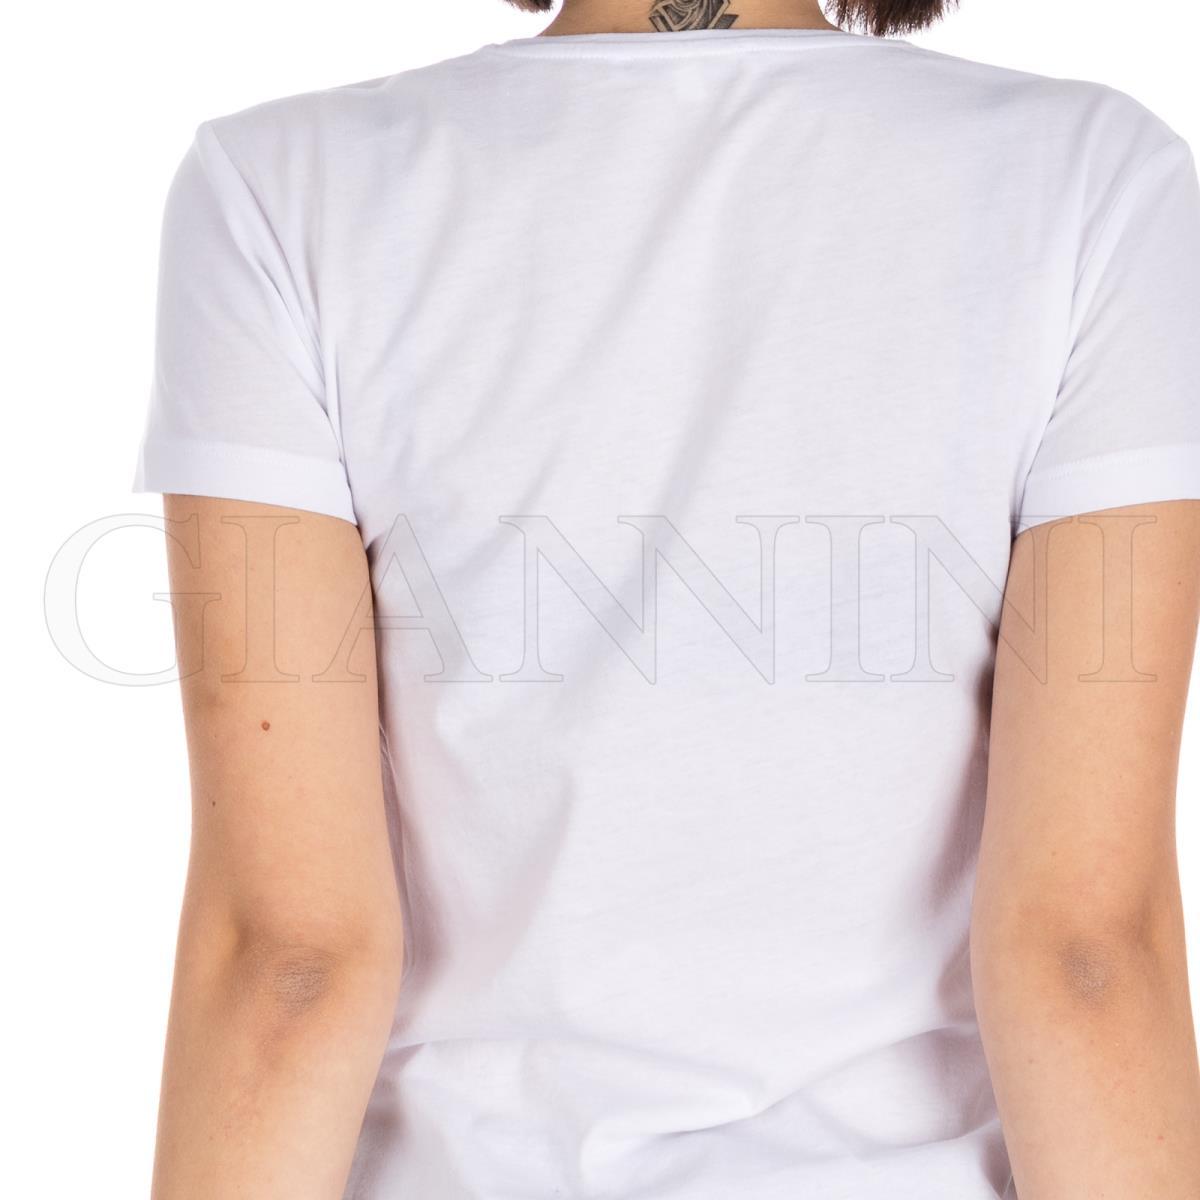 finest selection 8fceb 25f91 Patrizia Pepe T-shirt 8m0796/a4s2 | Giannini Shop Online